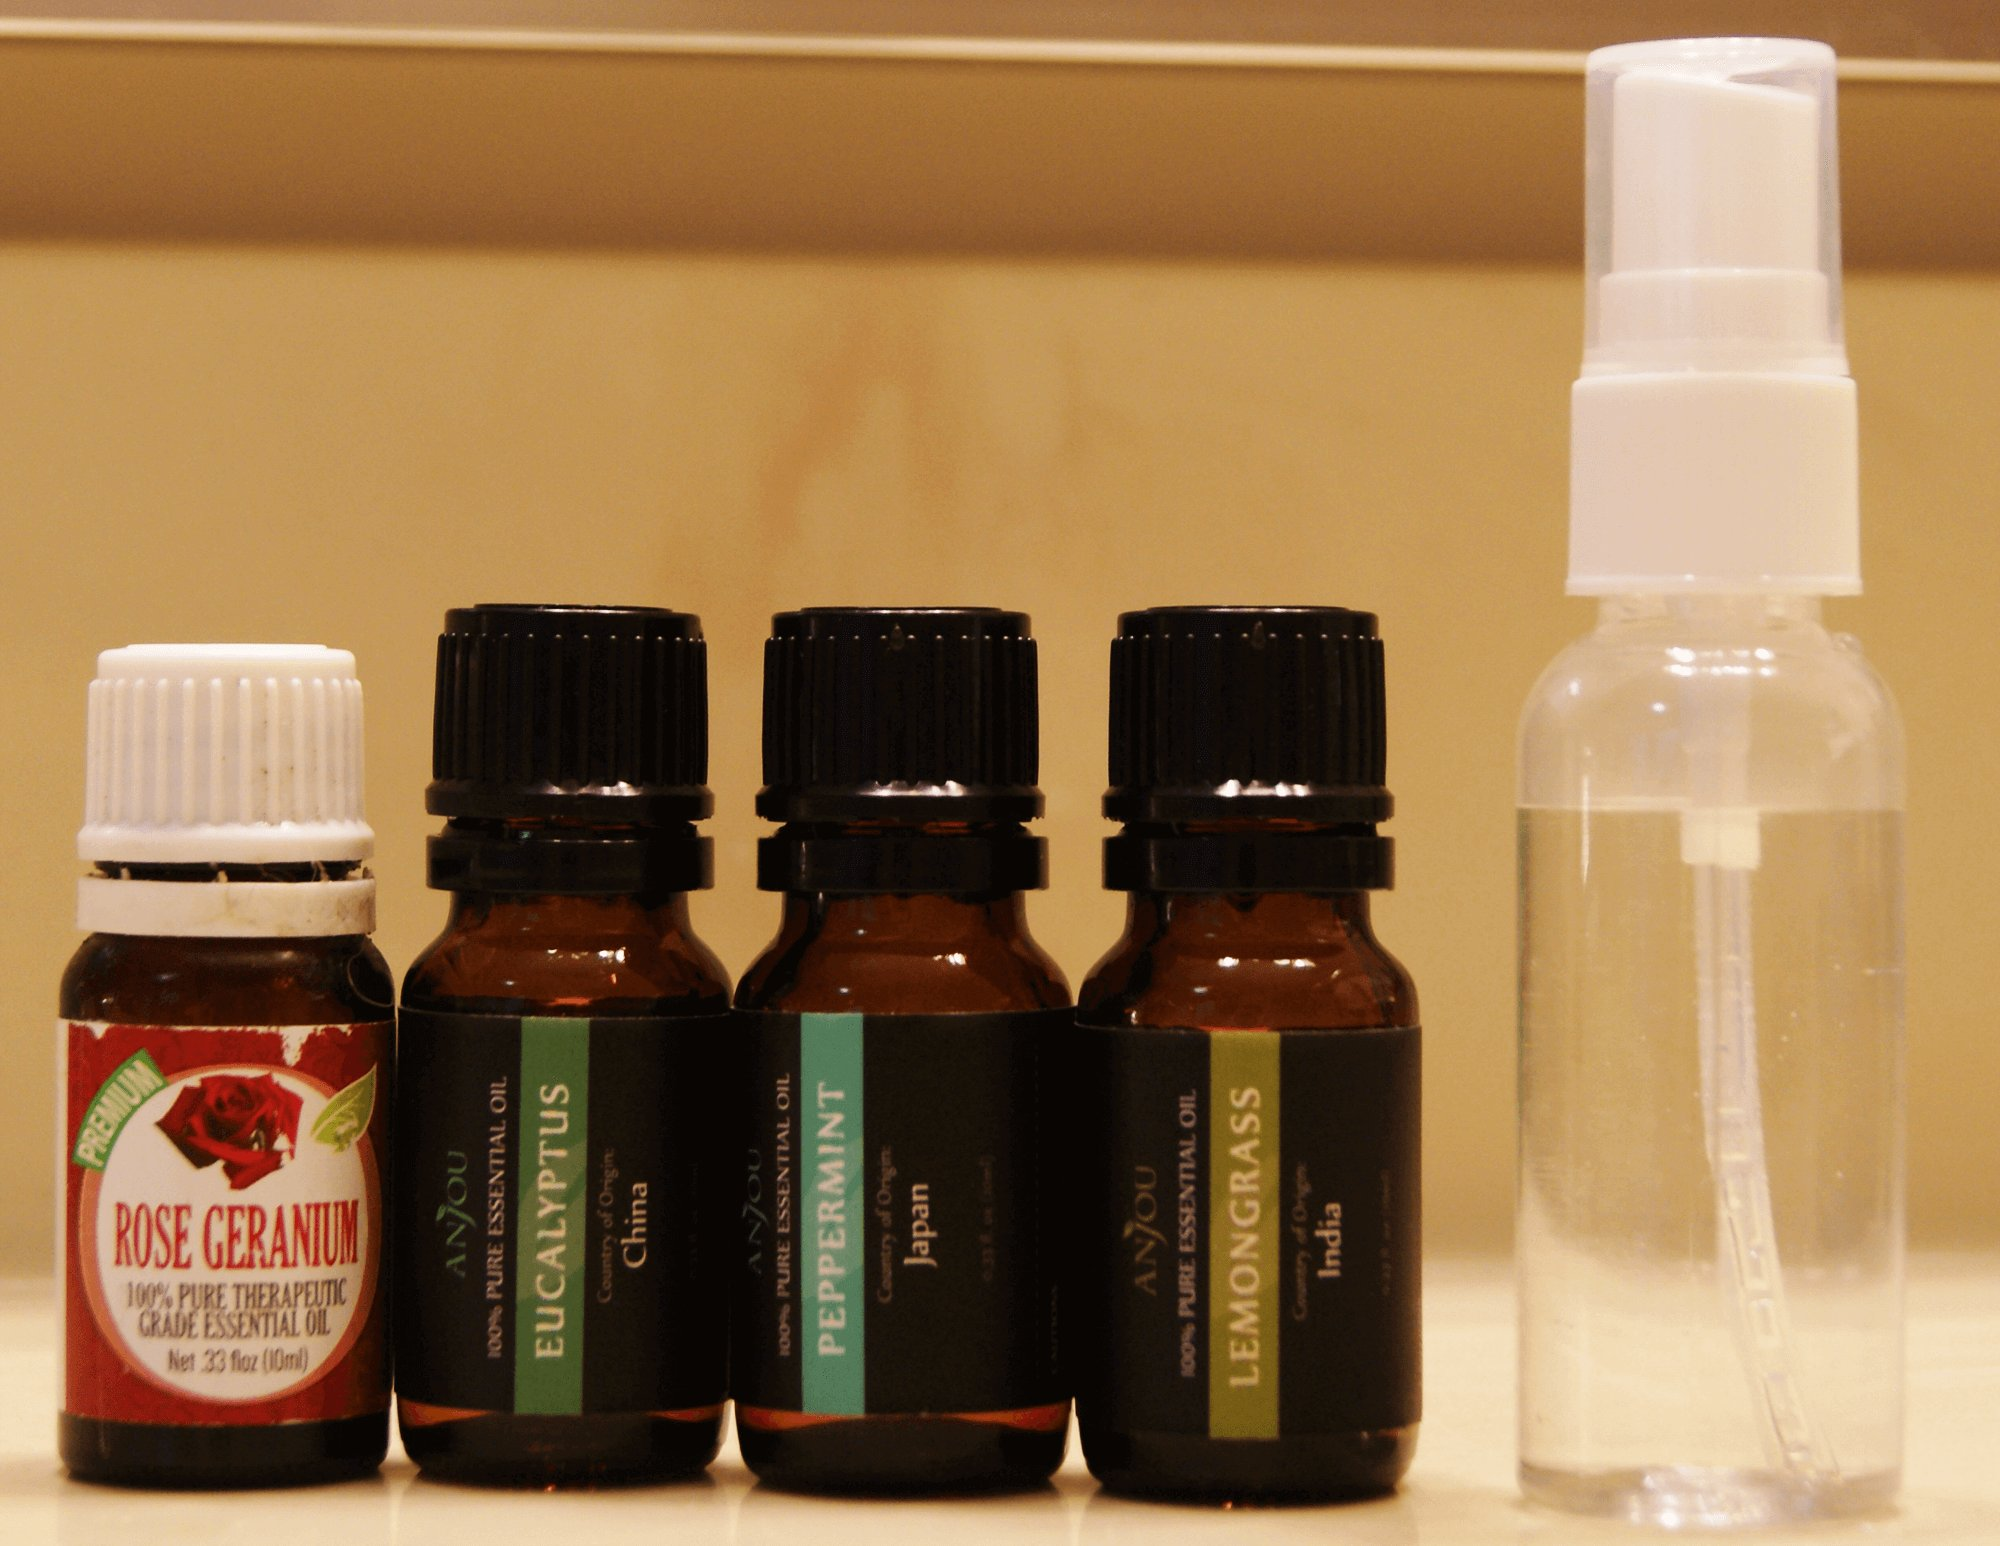 Essential Oil Spray for fleas